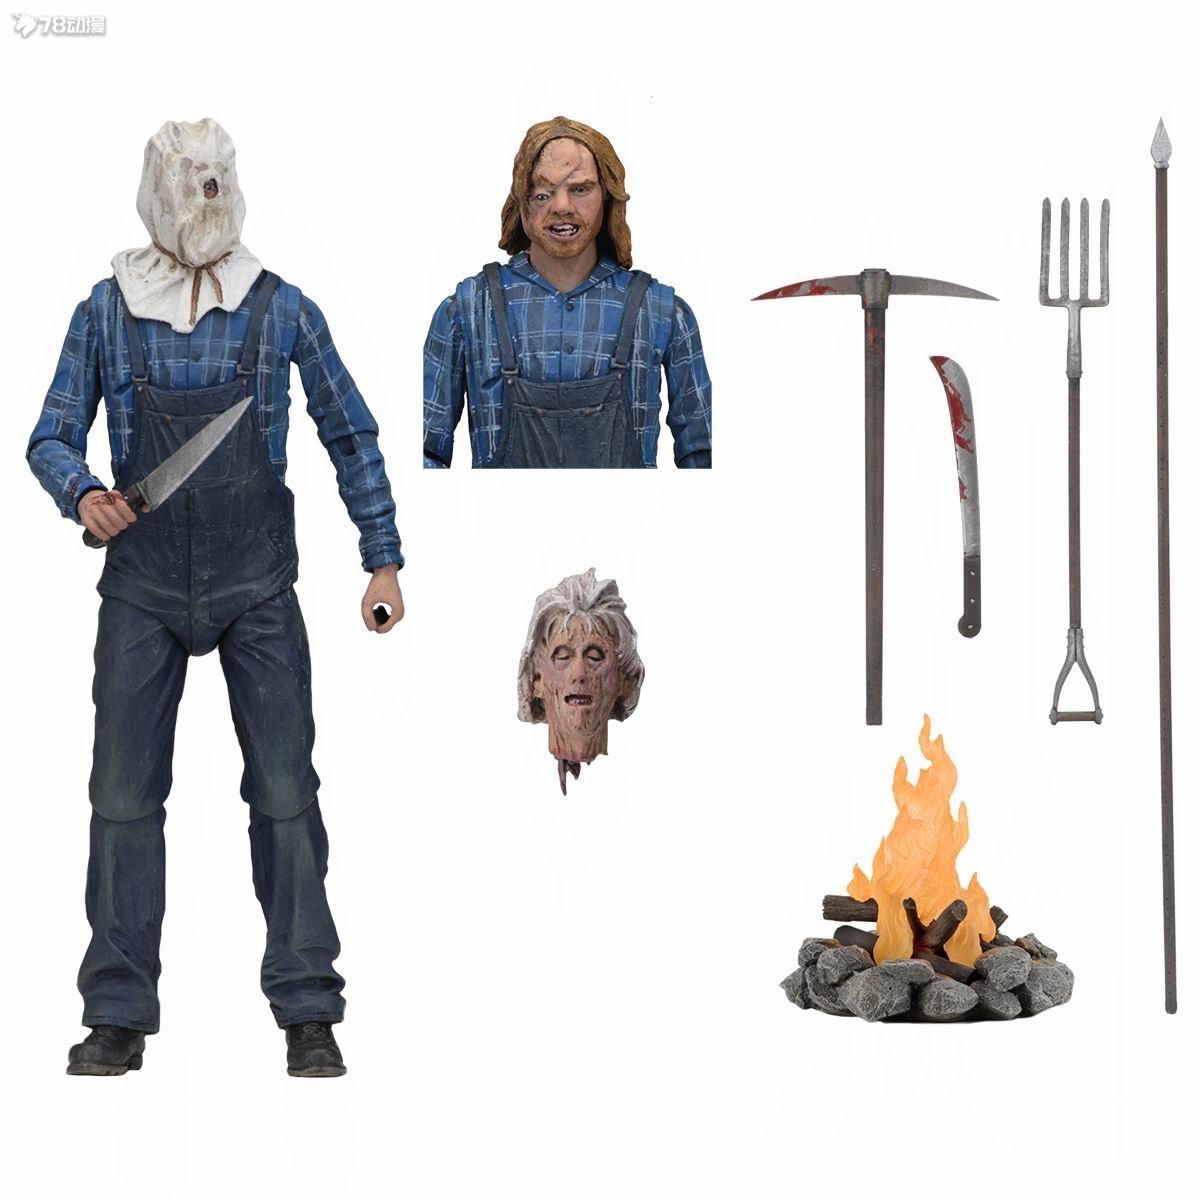 Ultimate-Part-2-Jason- - 副本.jpg